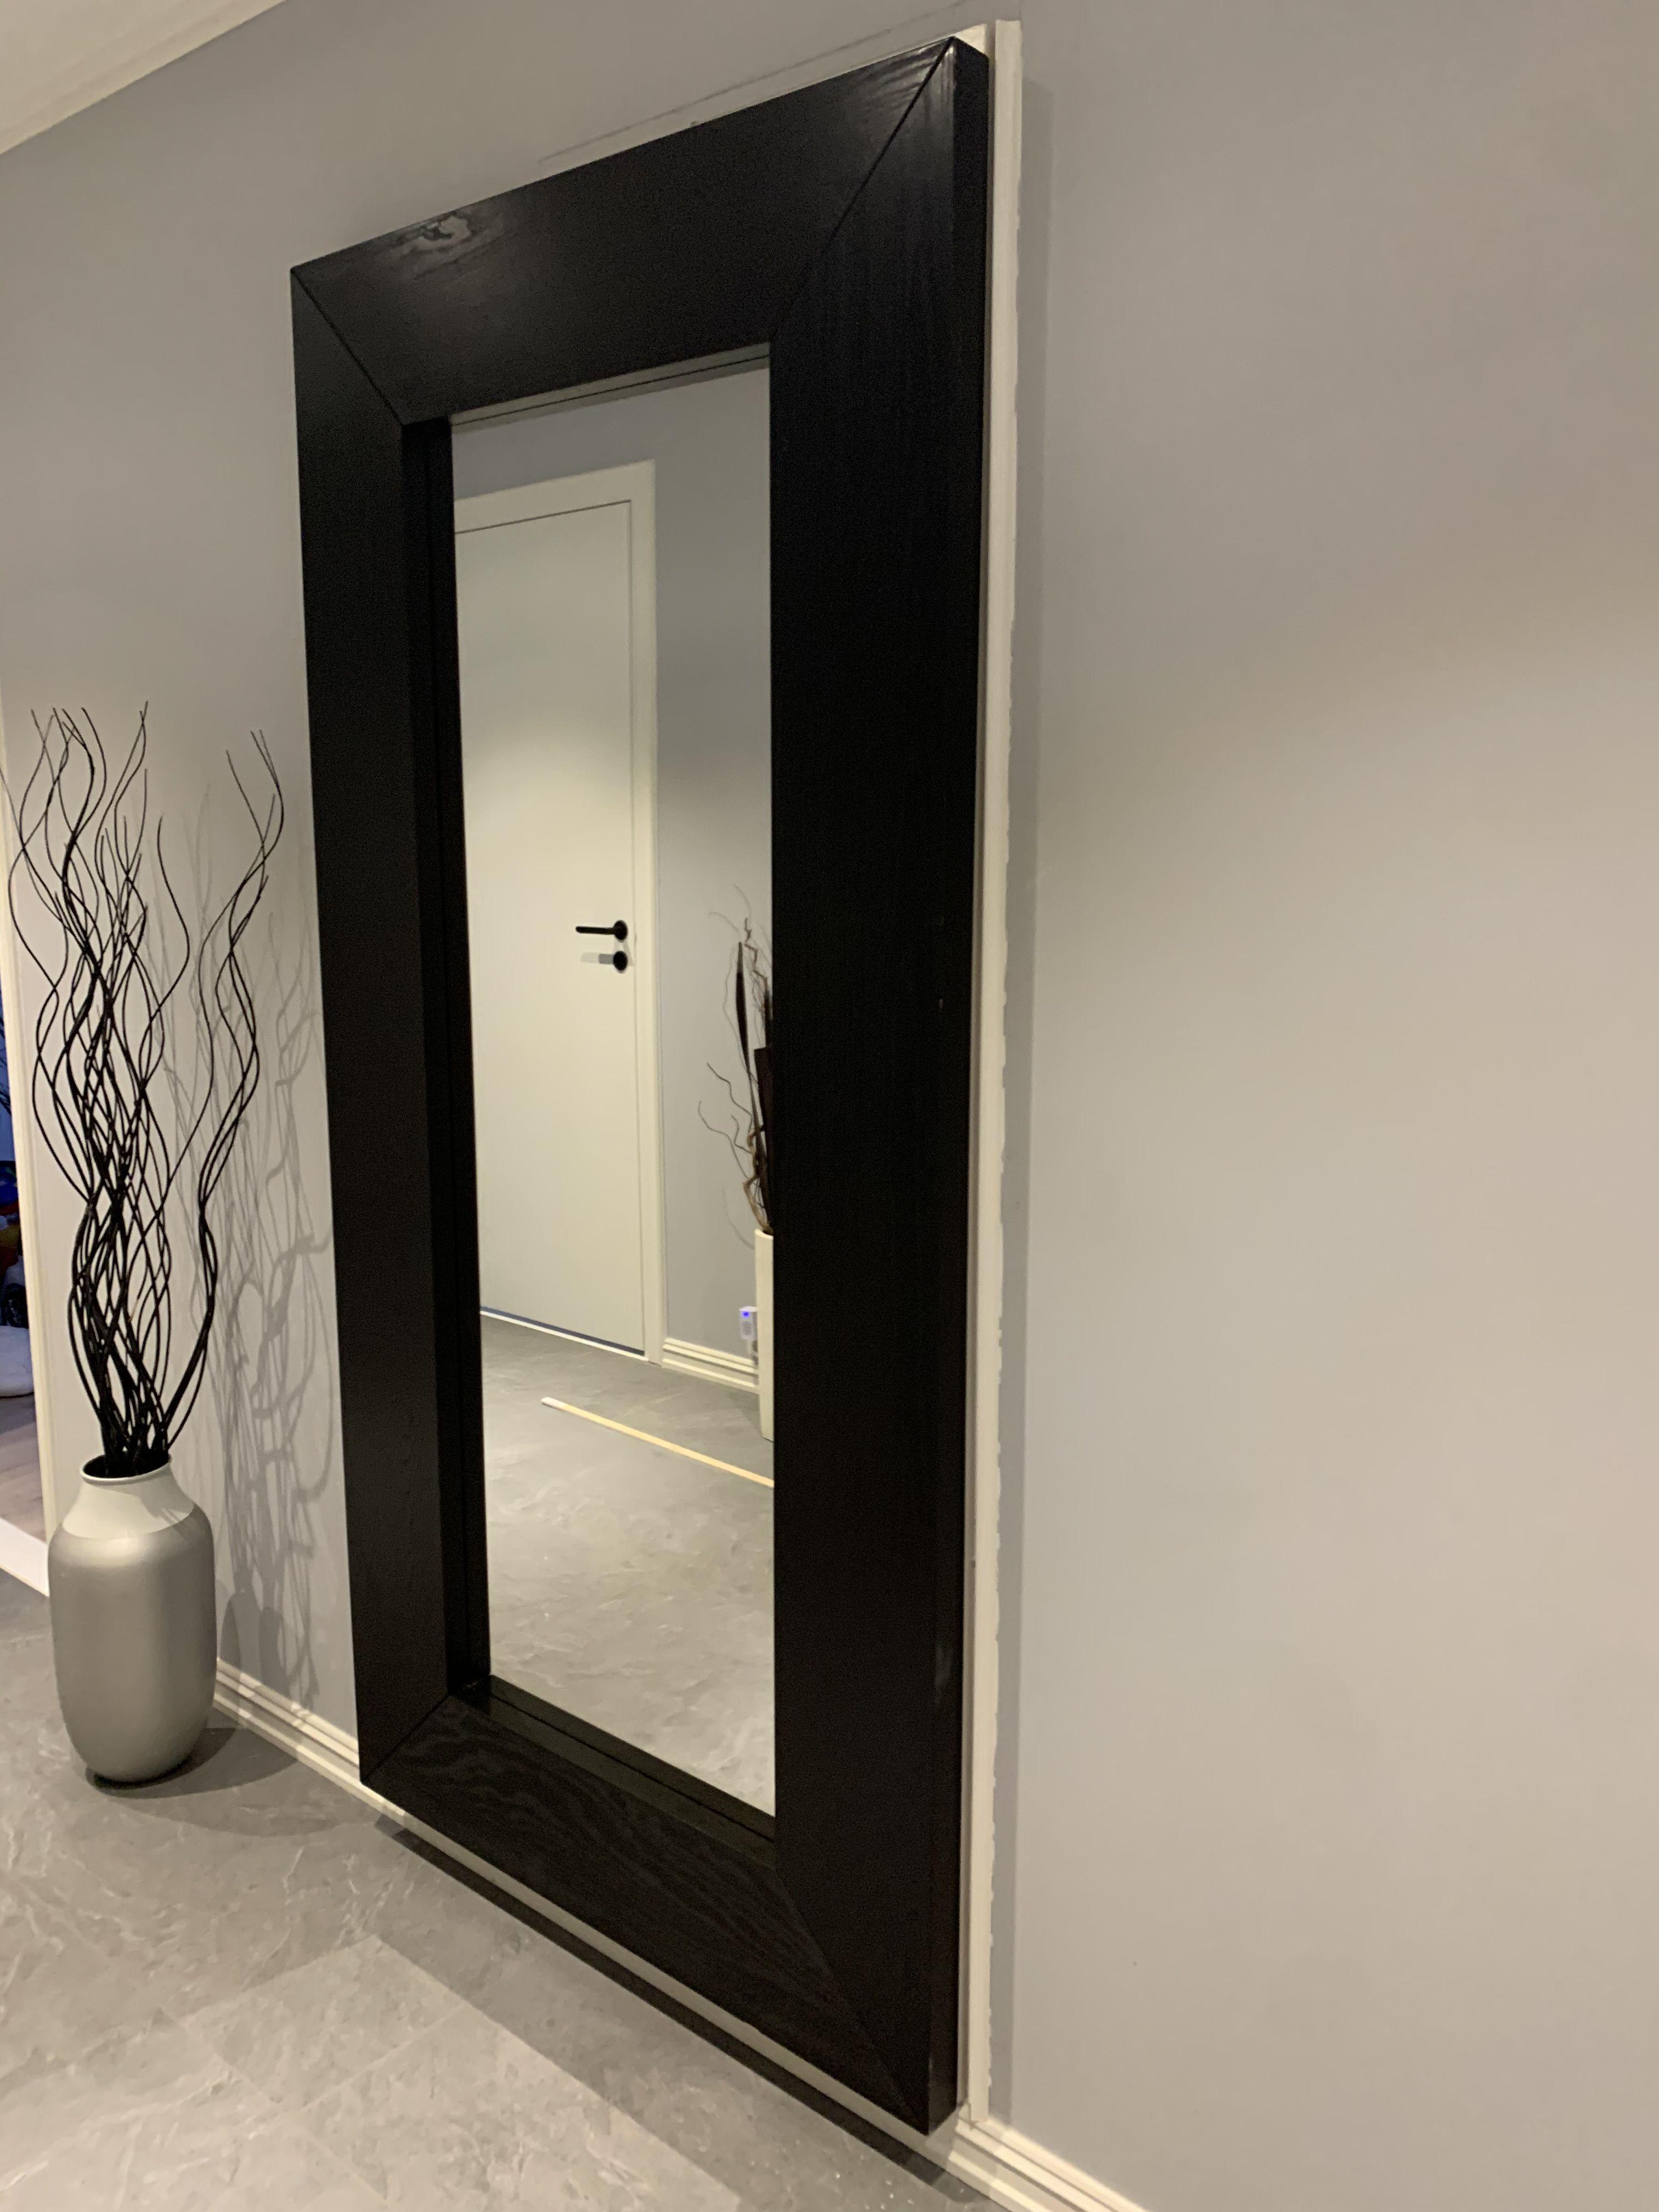 Mongstad Mirror Black Brown 37x74 3 4 Ikea In 2020 Mirror